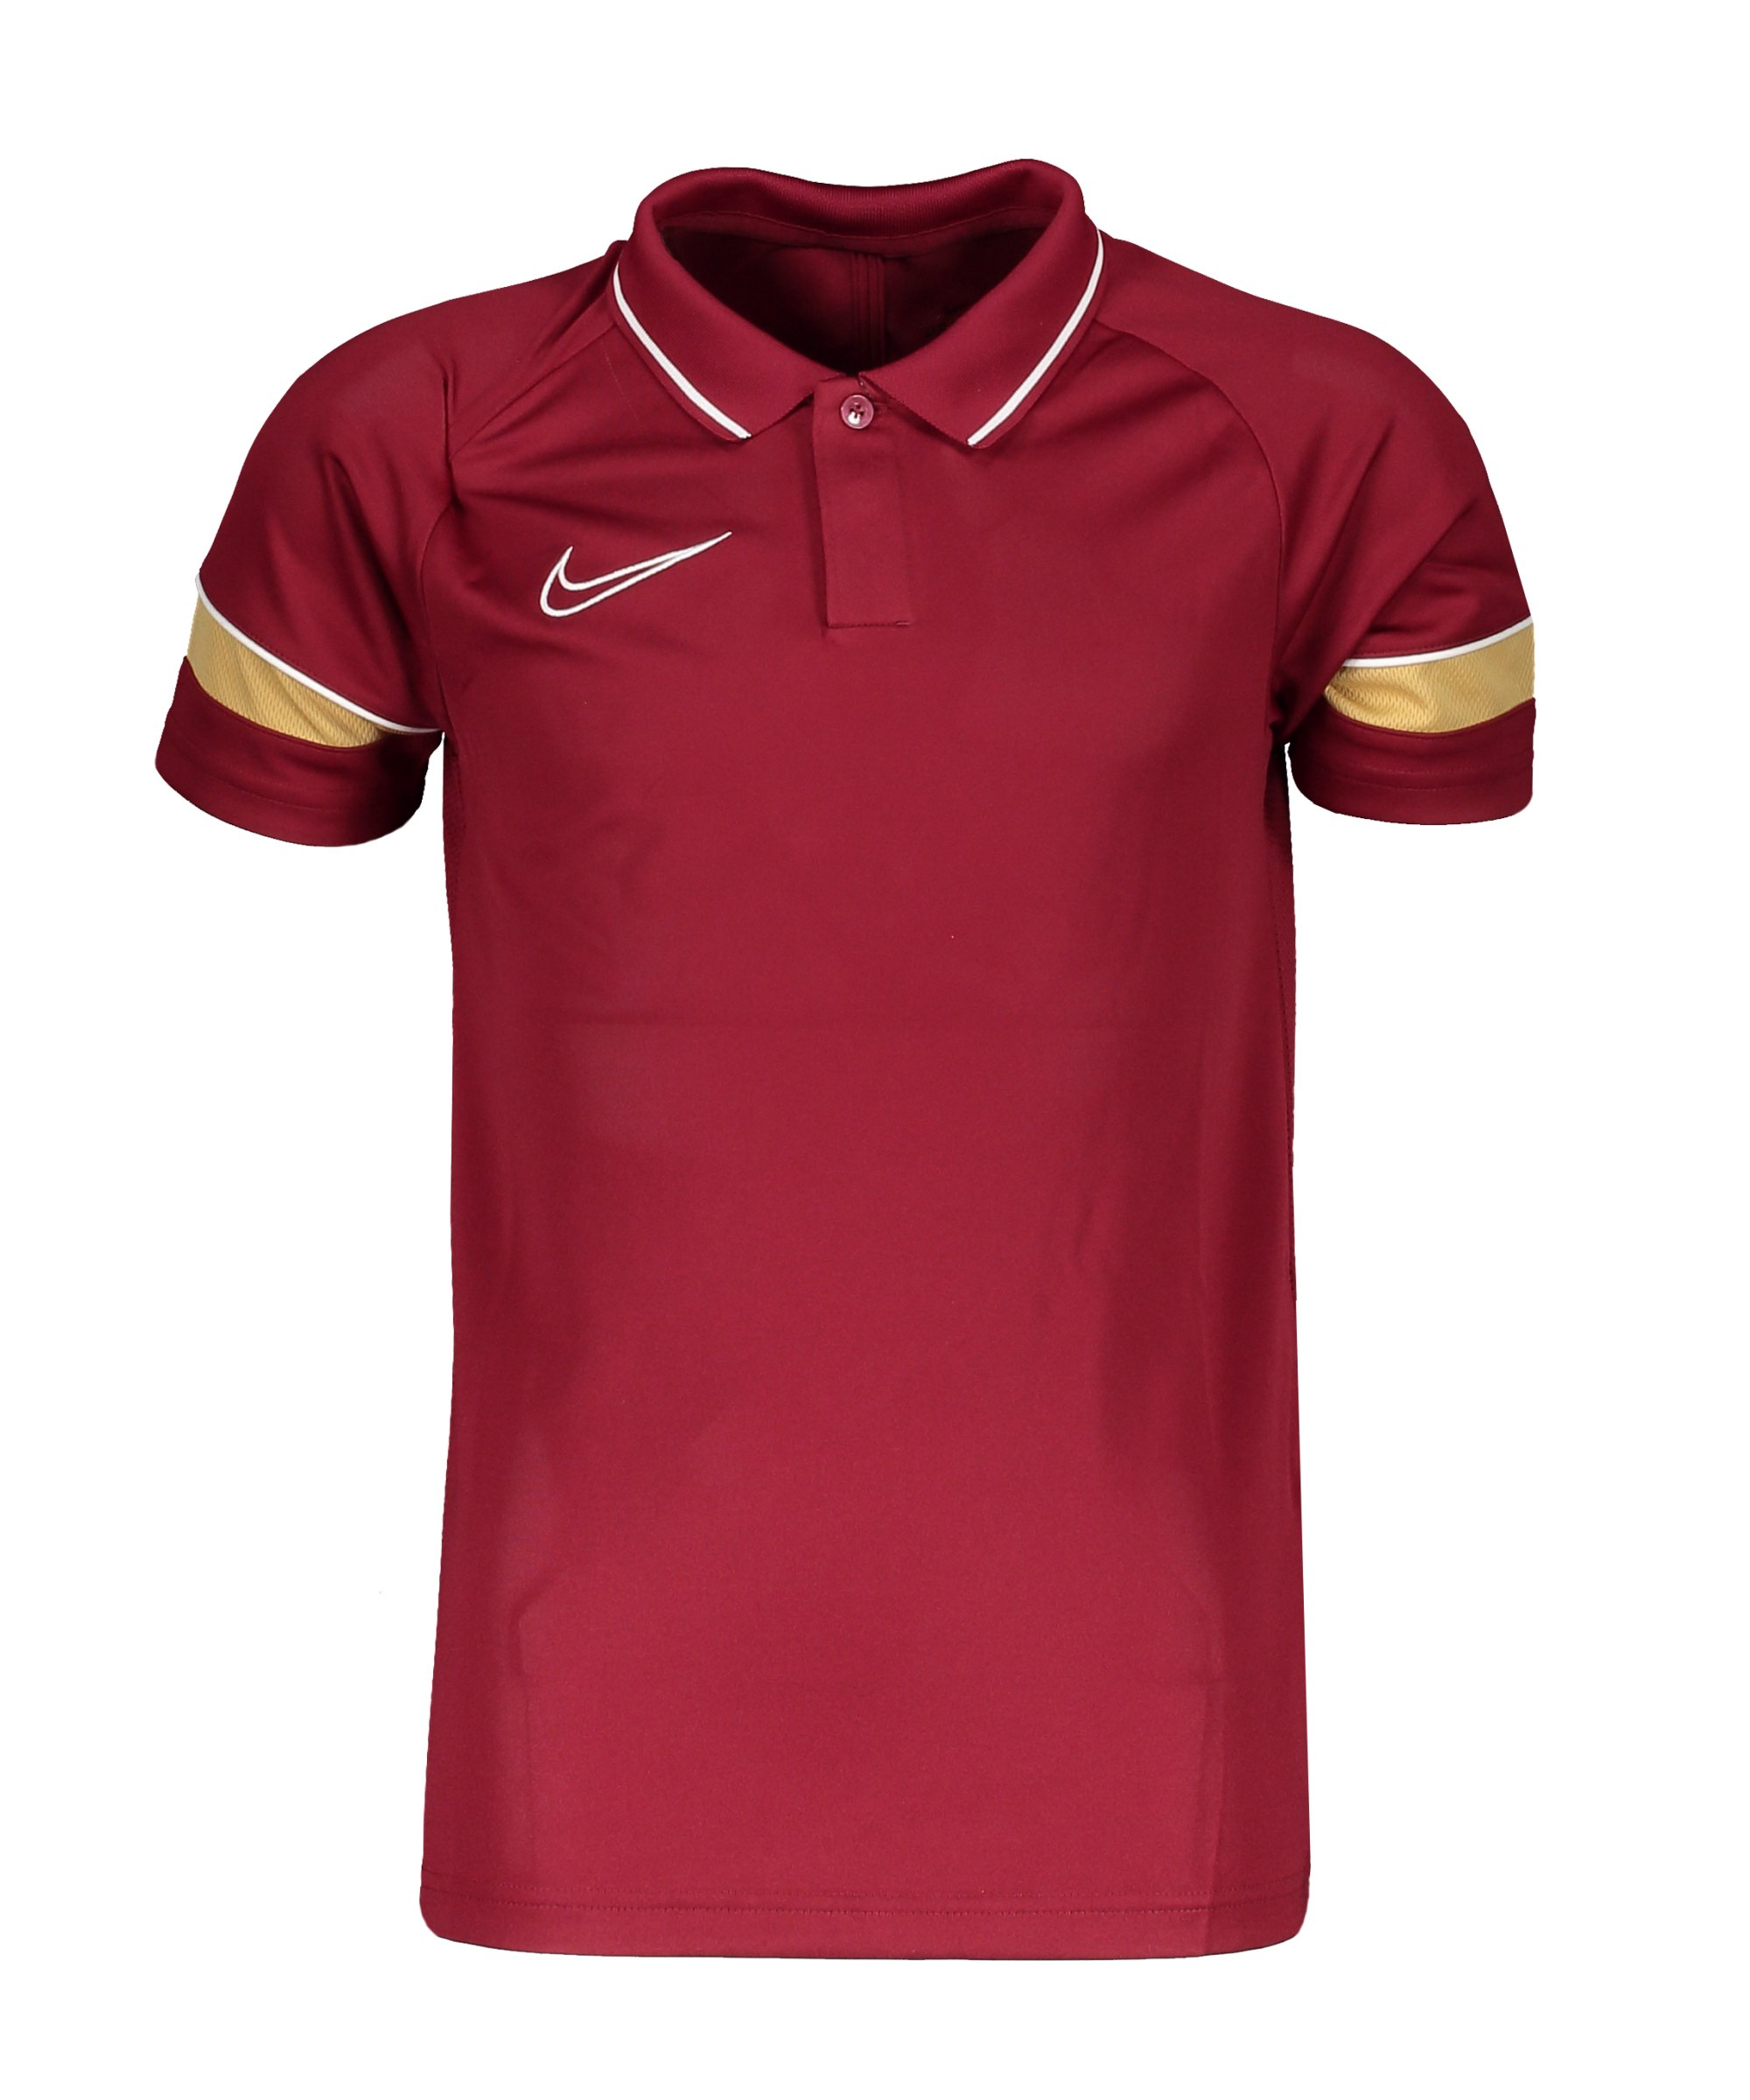 Nike Academy 21 Poloshirt Kids Rot Weiss F677 - rot